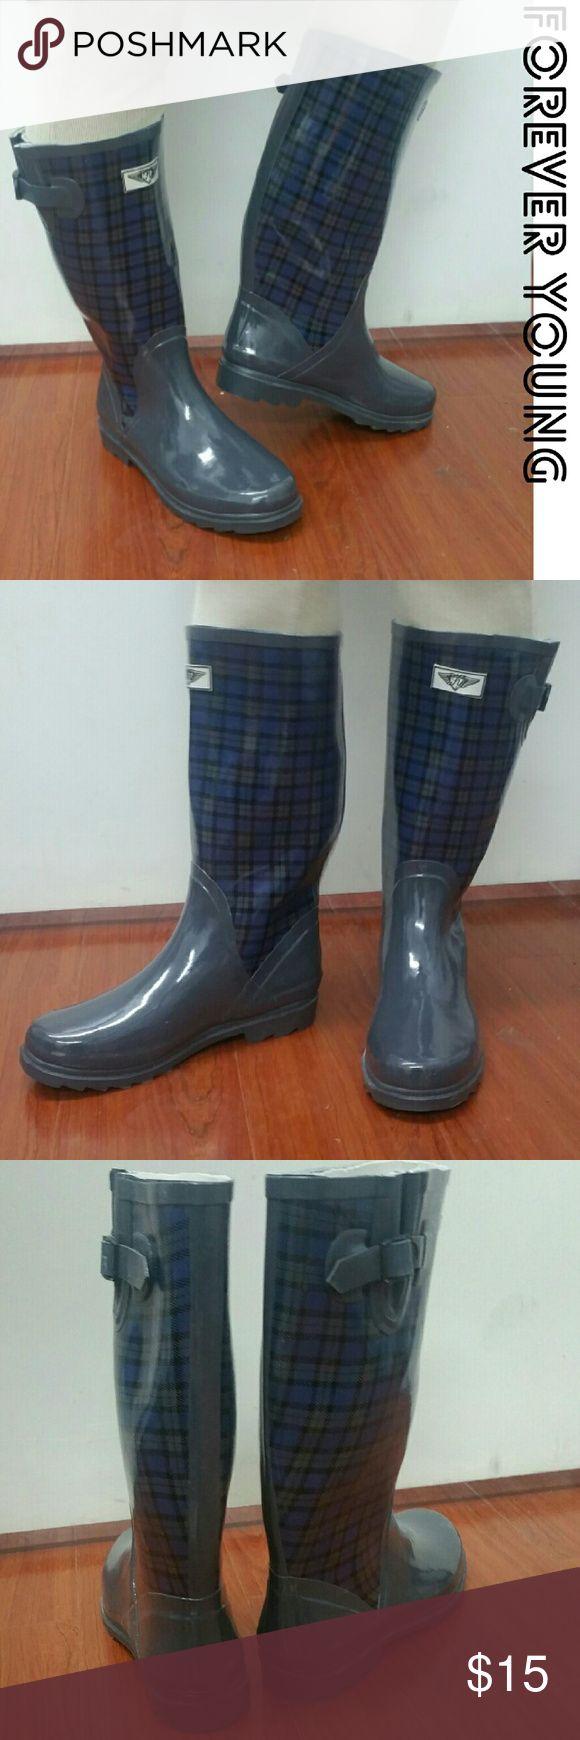 Elegant  Womensrainbootsmore1162 Tags Large Size Womens Shoes Size 12